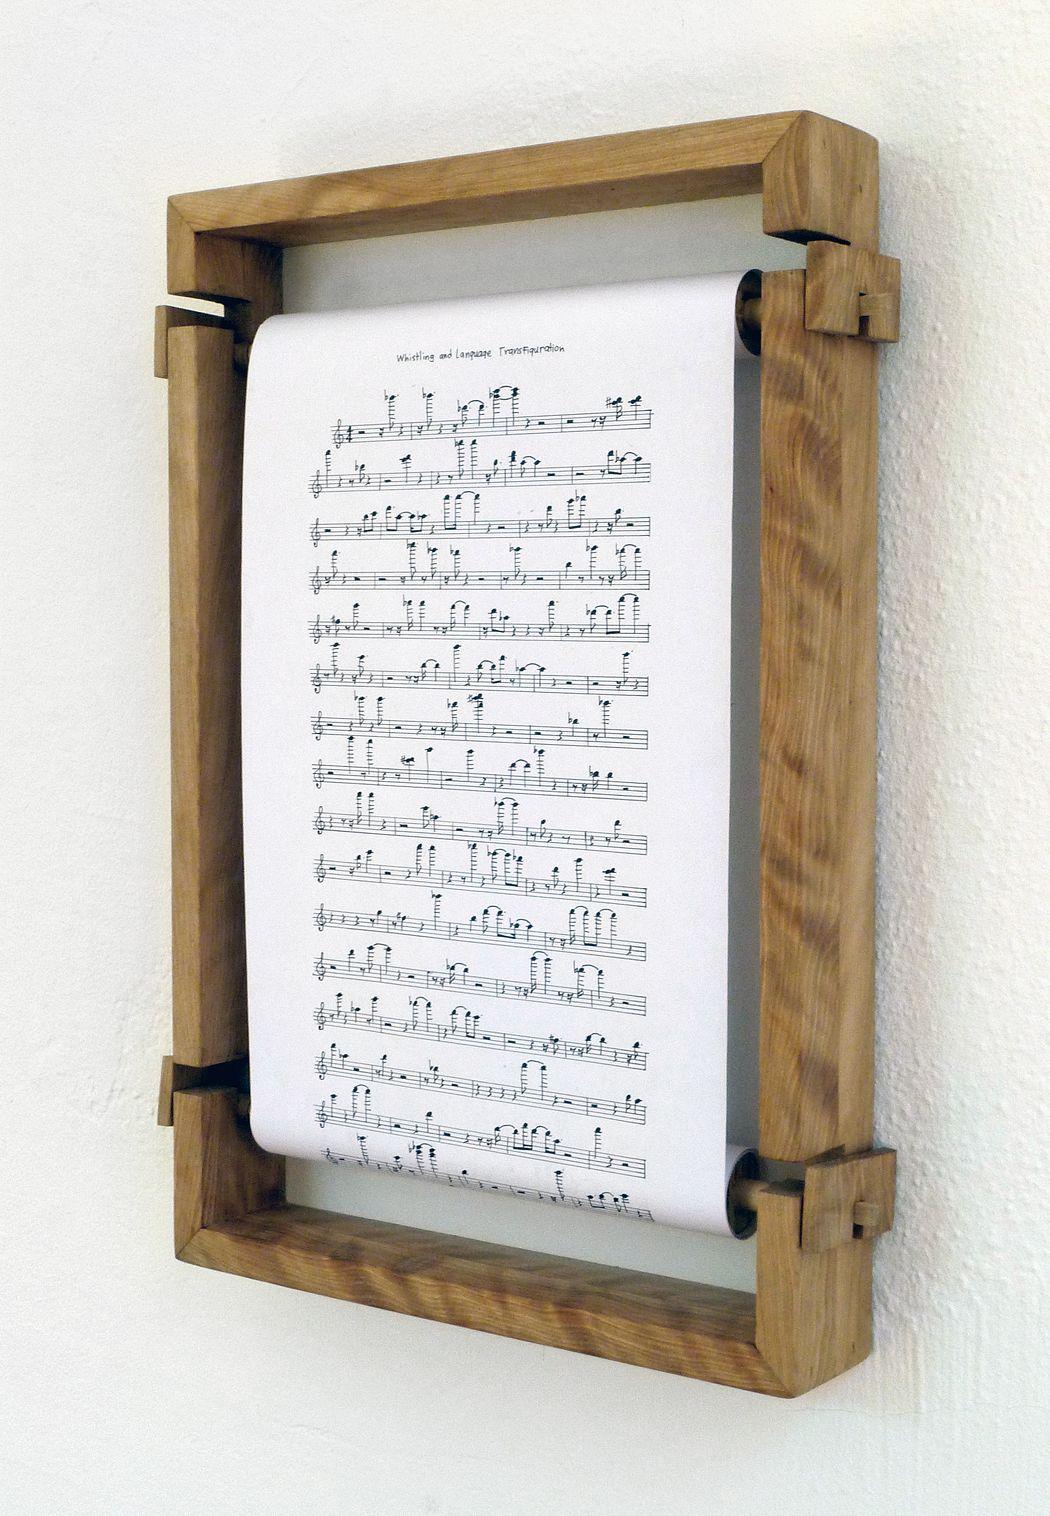 Whistling Score, 2012